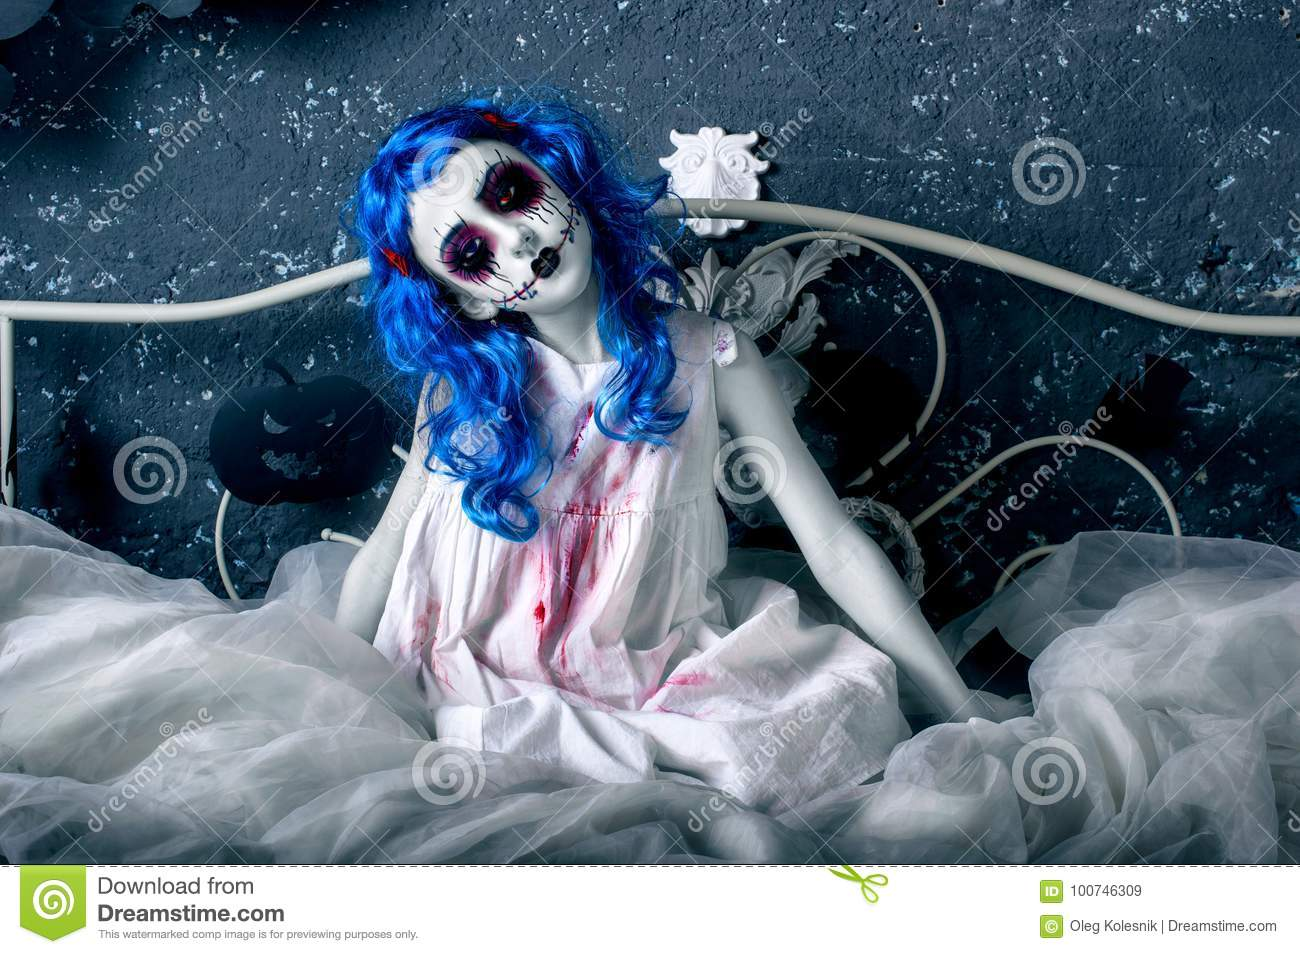 little blue hair girl bloody dress scary halloween makeup sitting bed little blue hair girl bloody dress